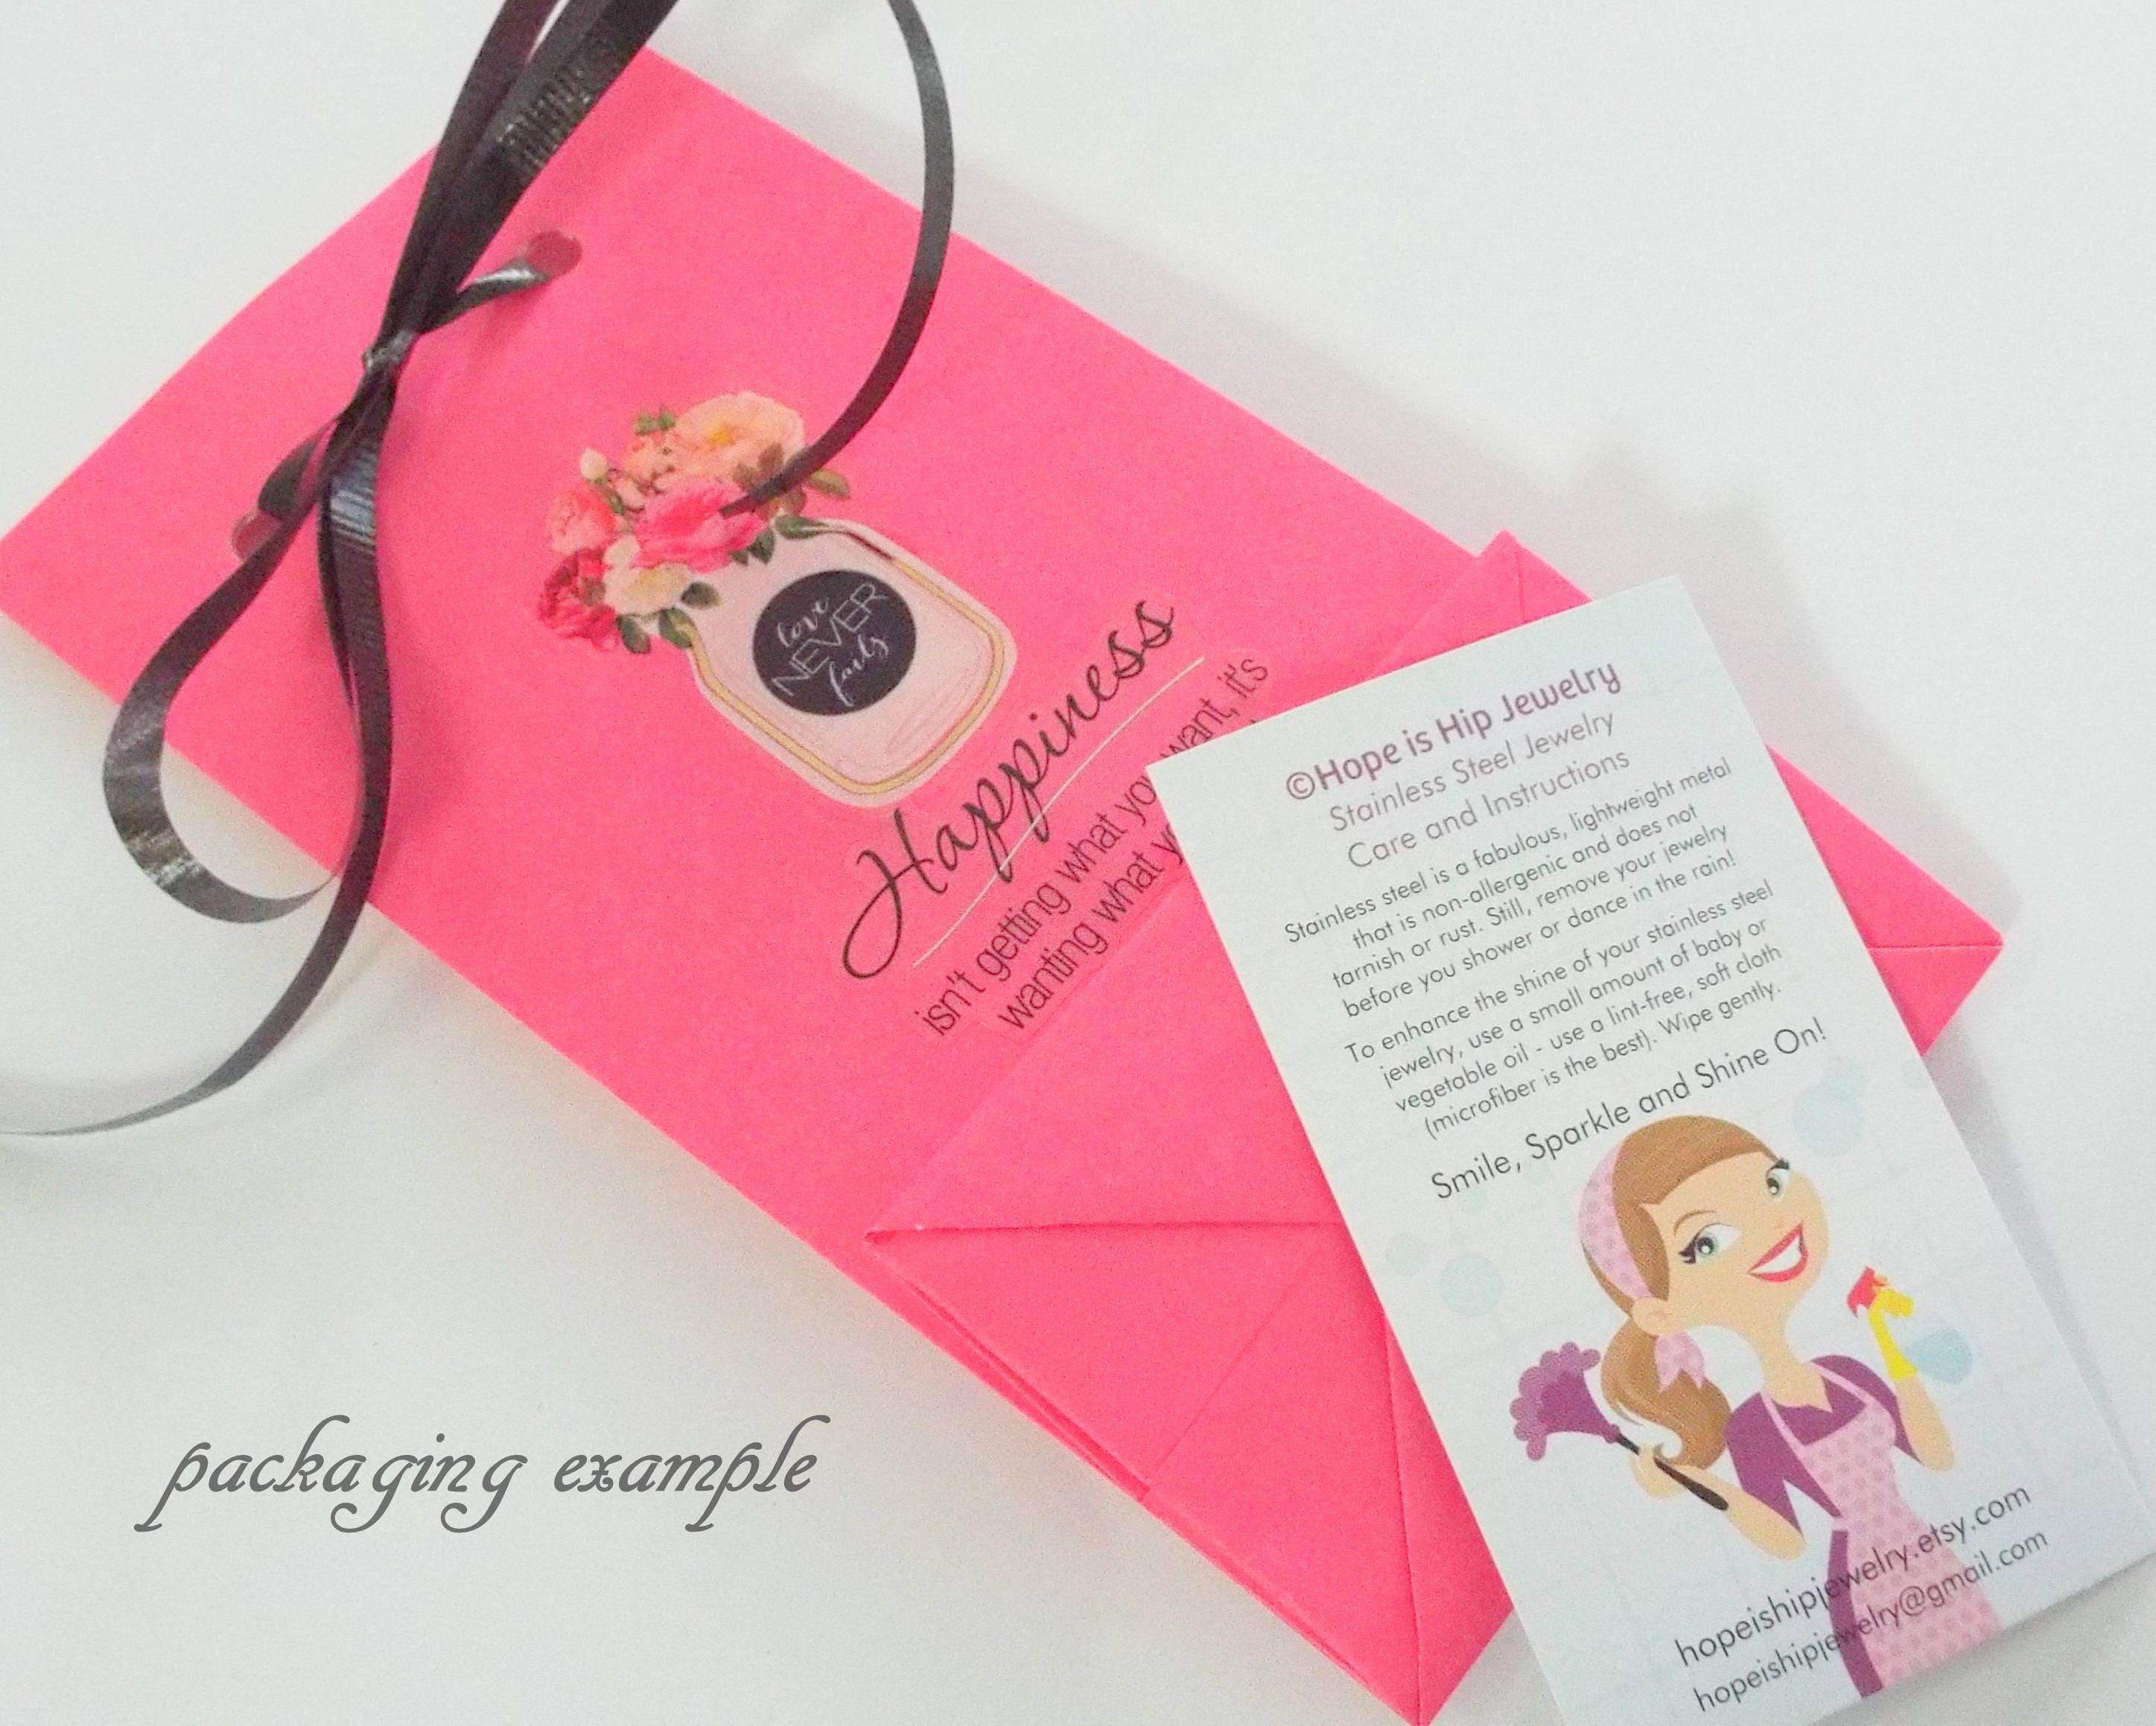 13th Birthday Girl Charm Bracelet Teenage Daughter Gift Ideas Girls Thirteenth 13 Year Old